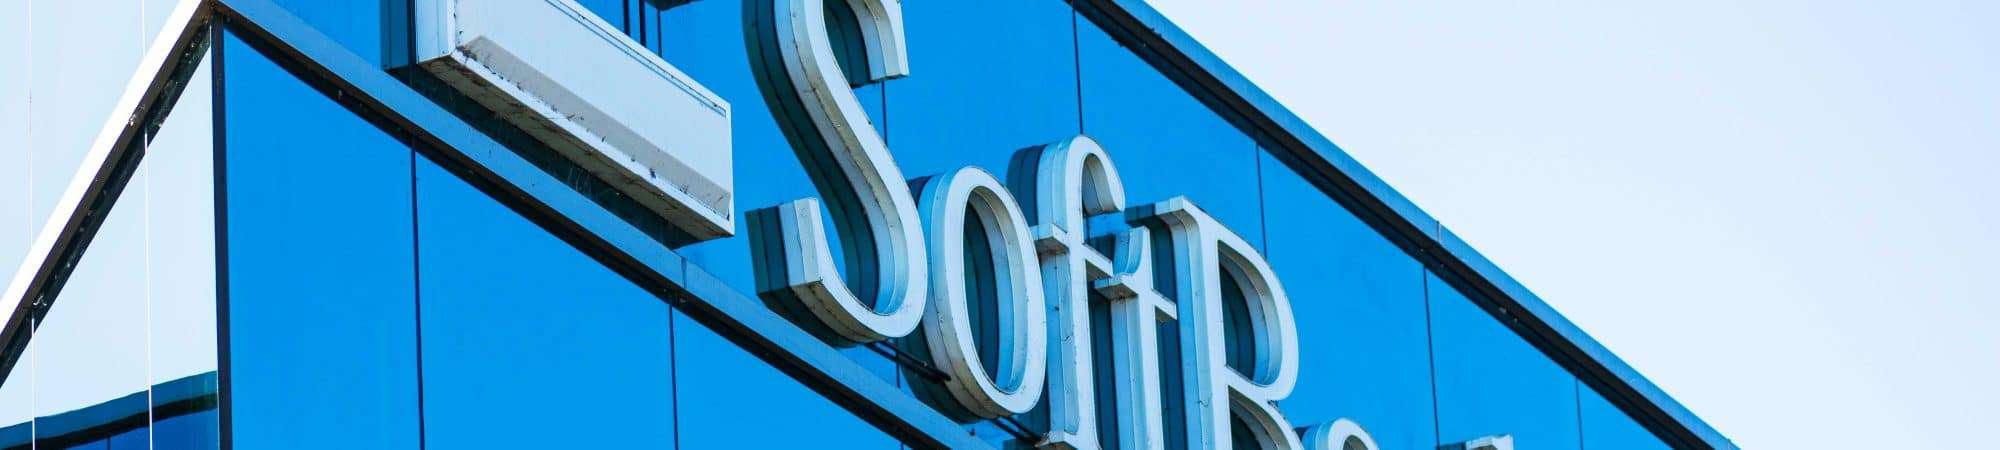 Fachada da empresa SoftBank